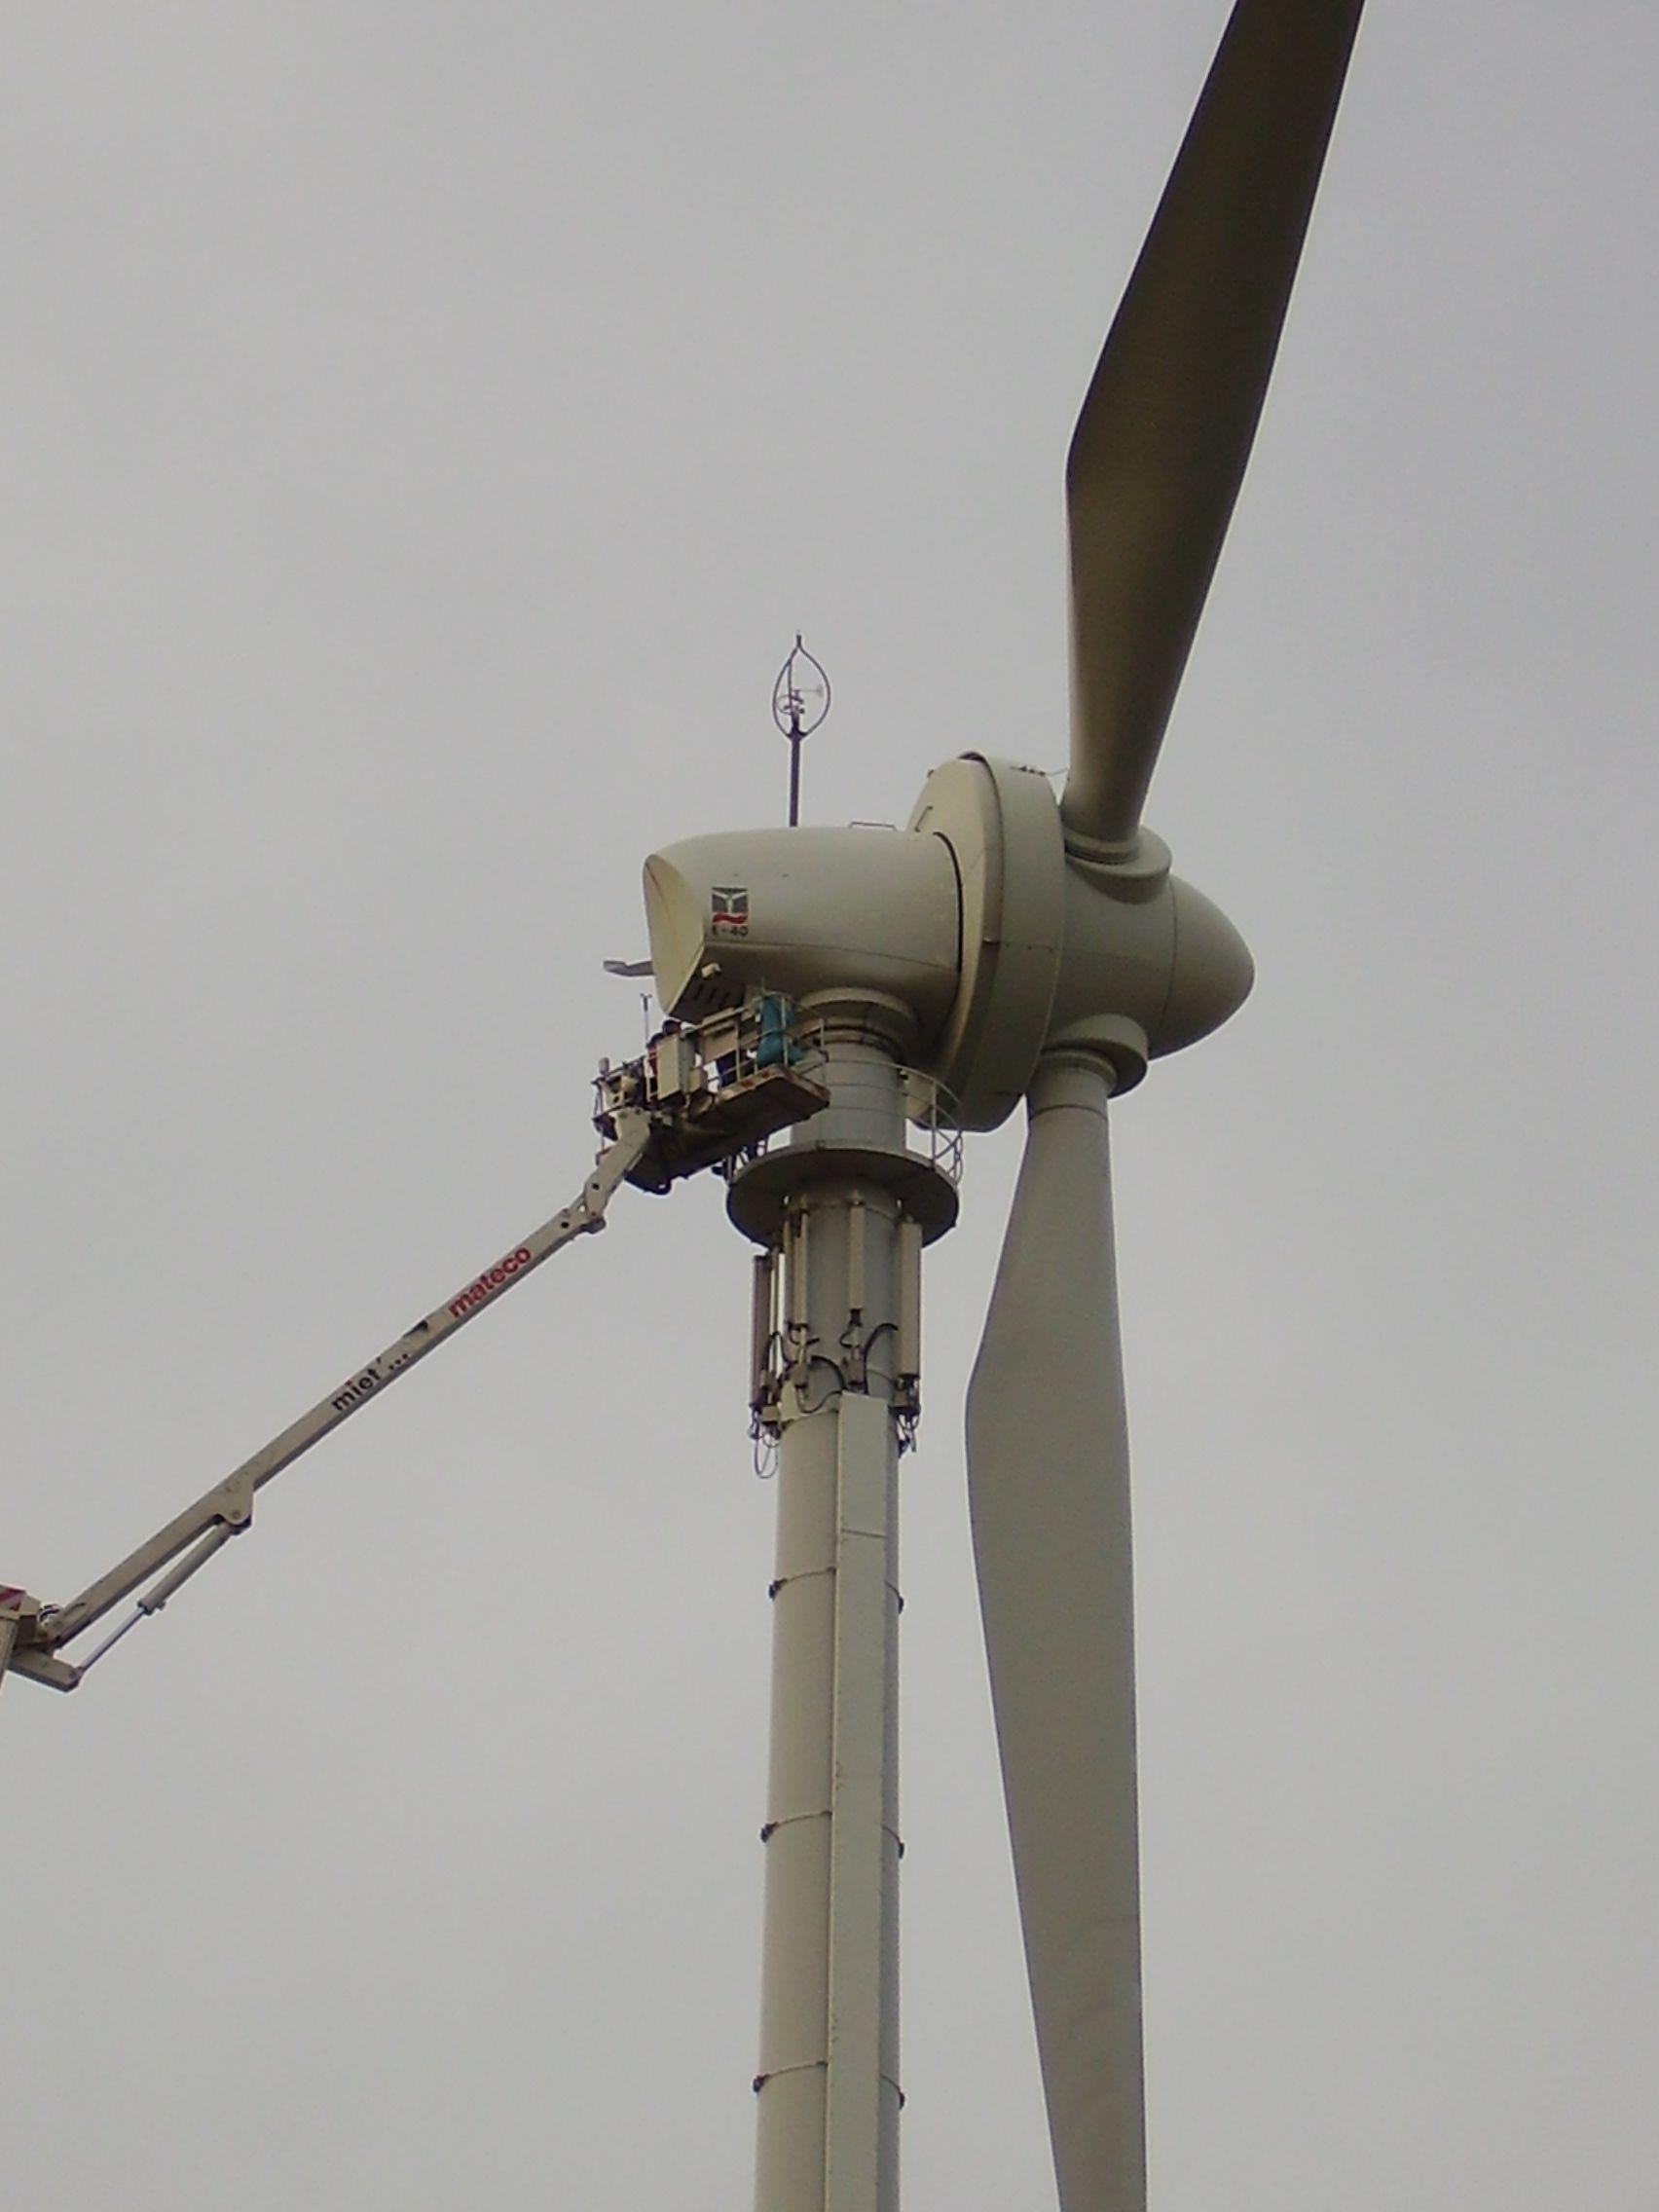 Wind Turbine Operations and Maintenance User Group Scope